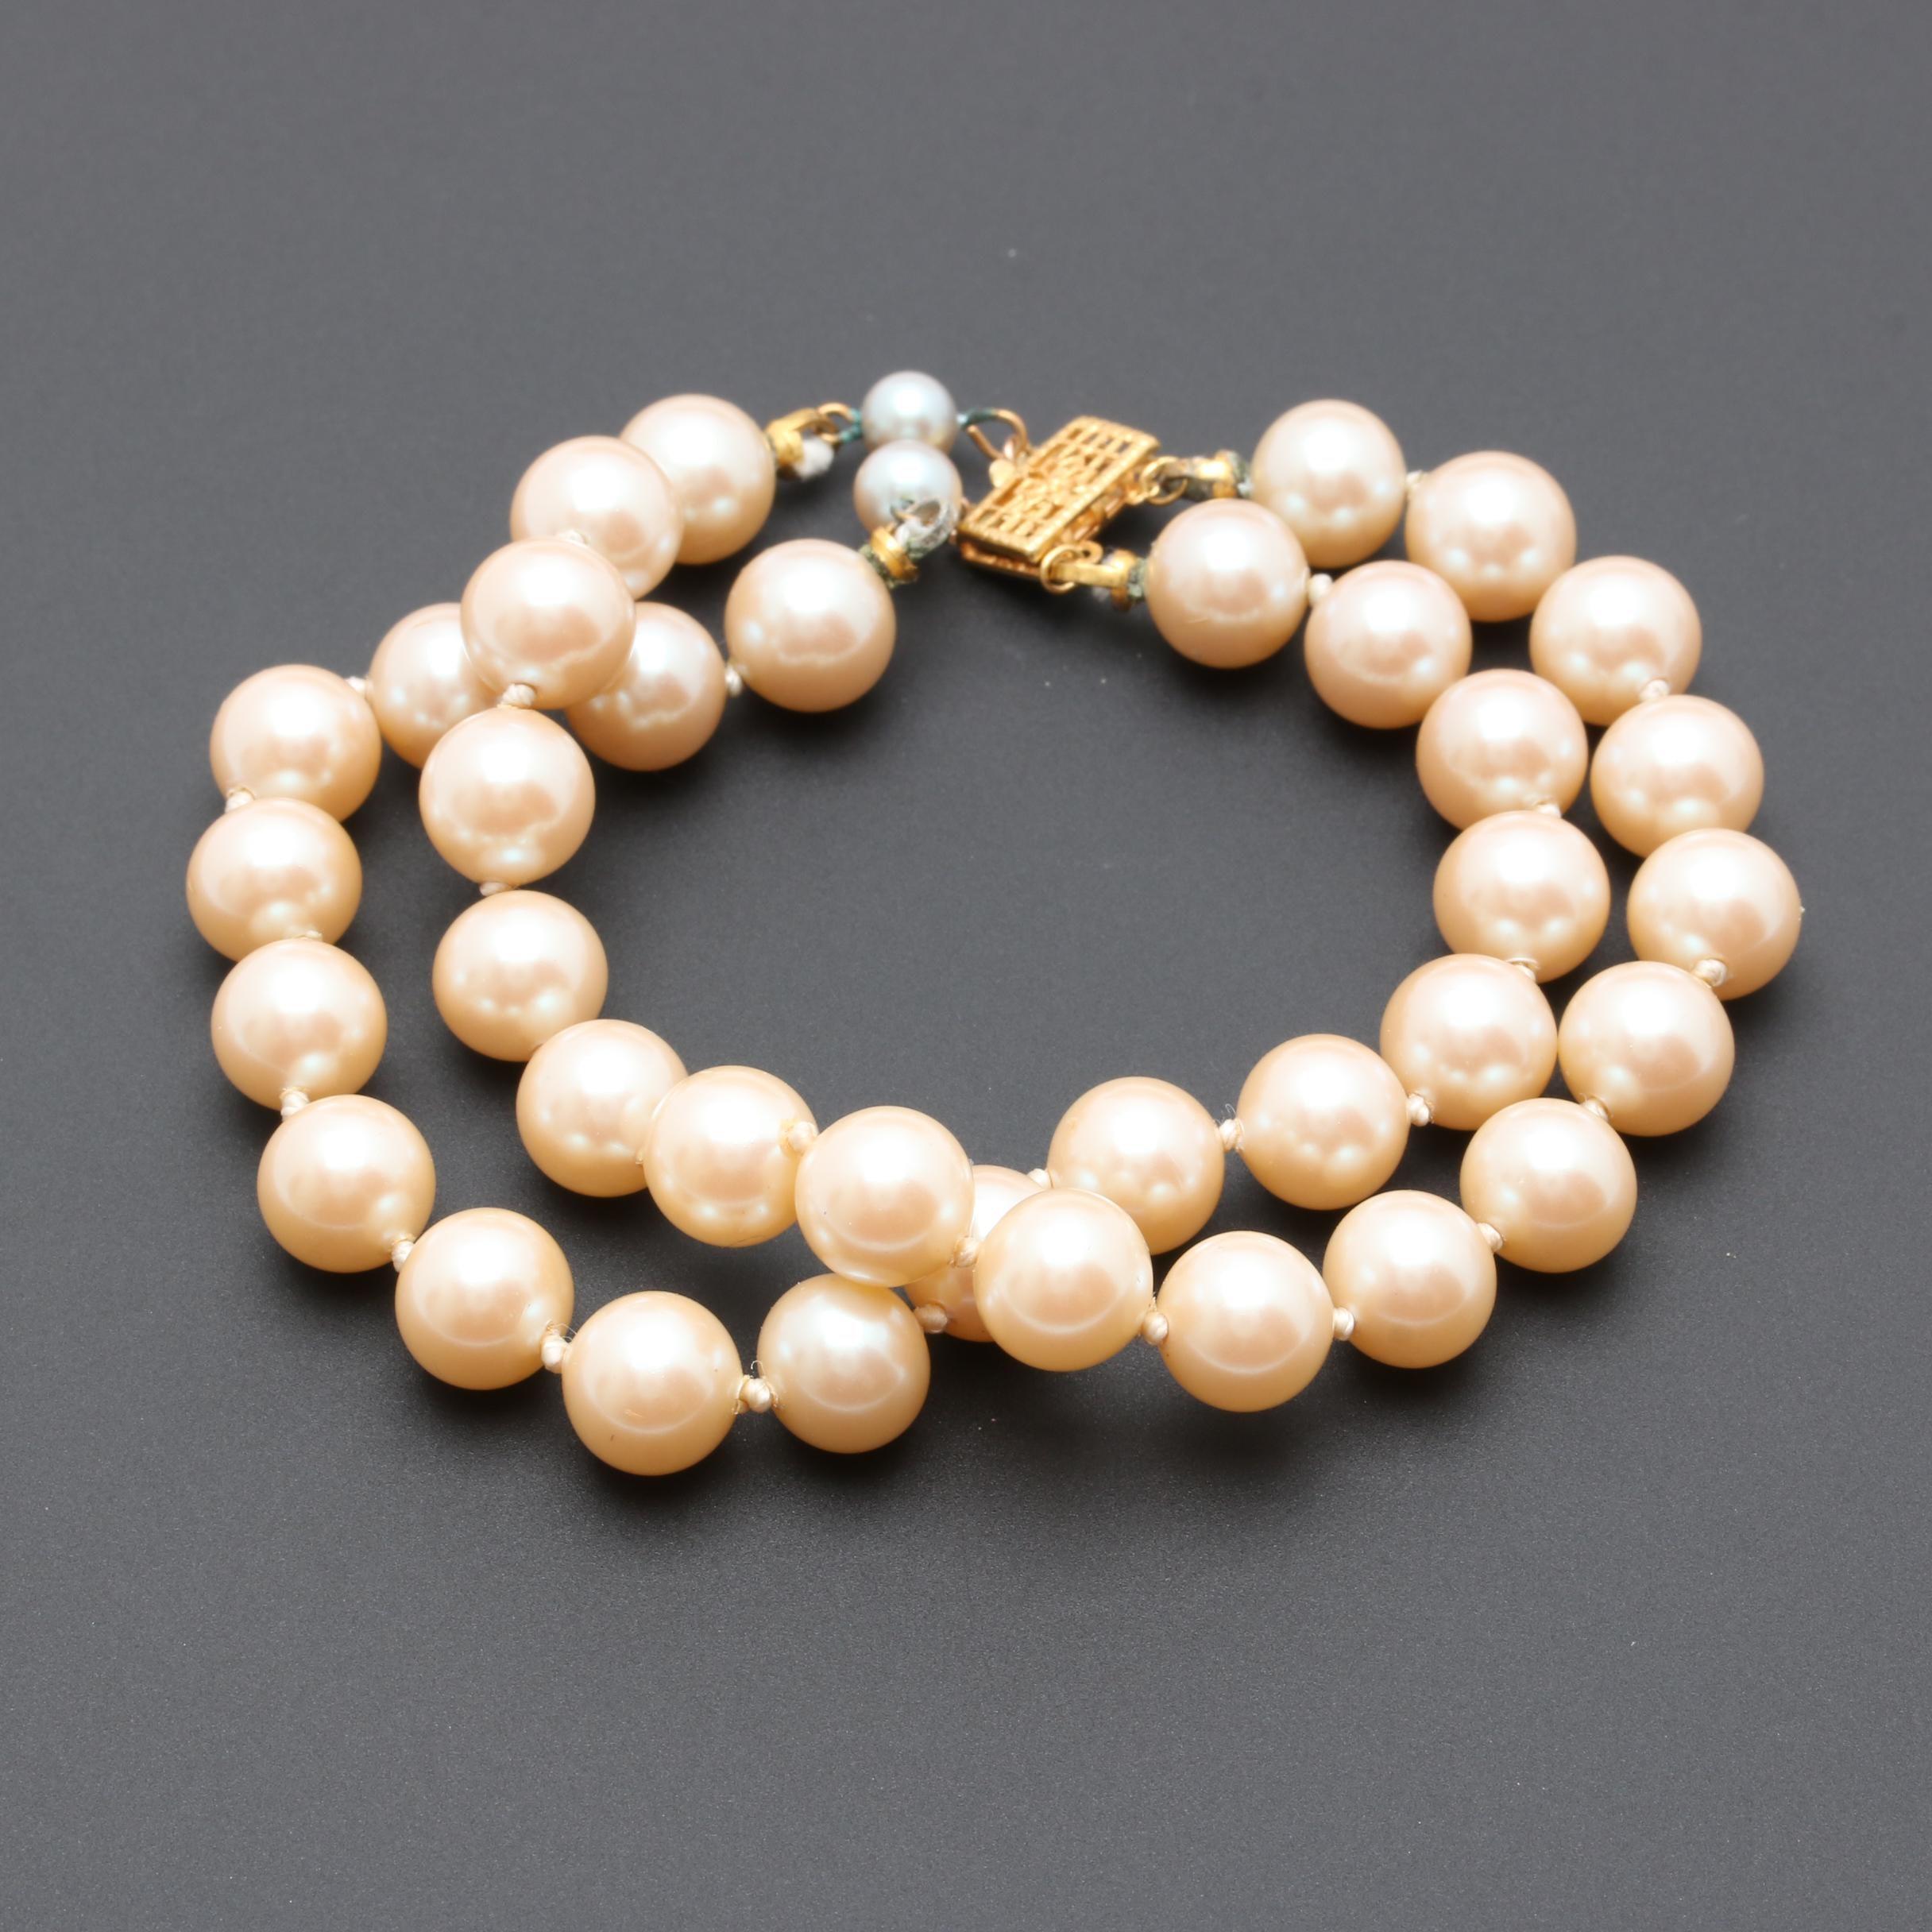 14K Yellow Gold Imitation Pearl Dual Strand Bracelet